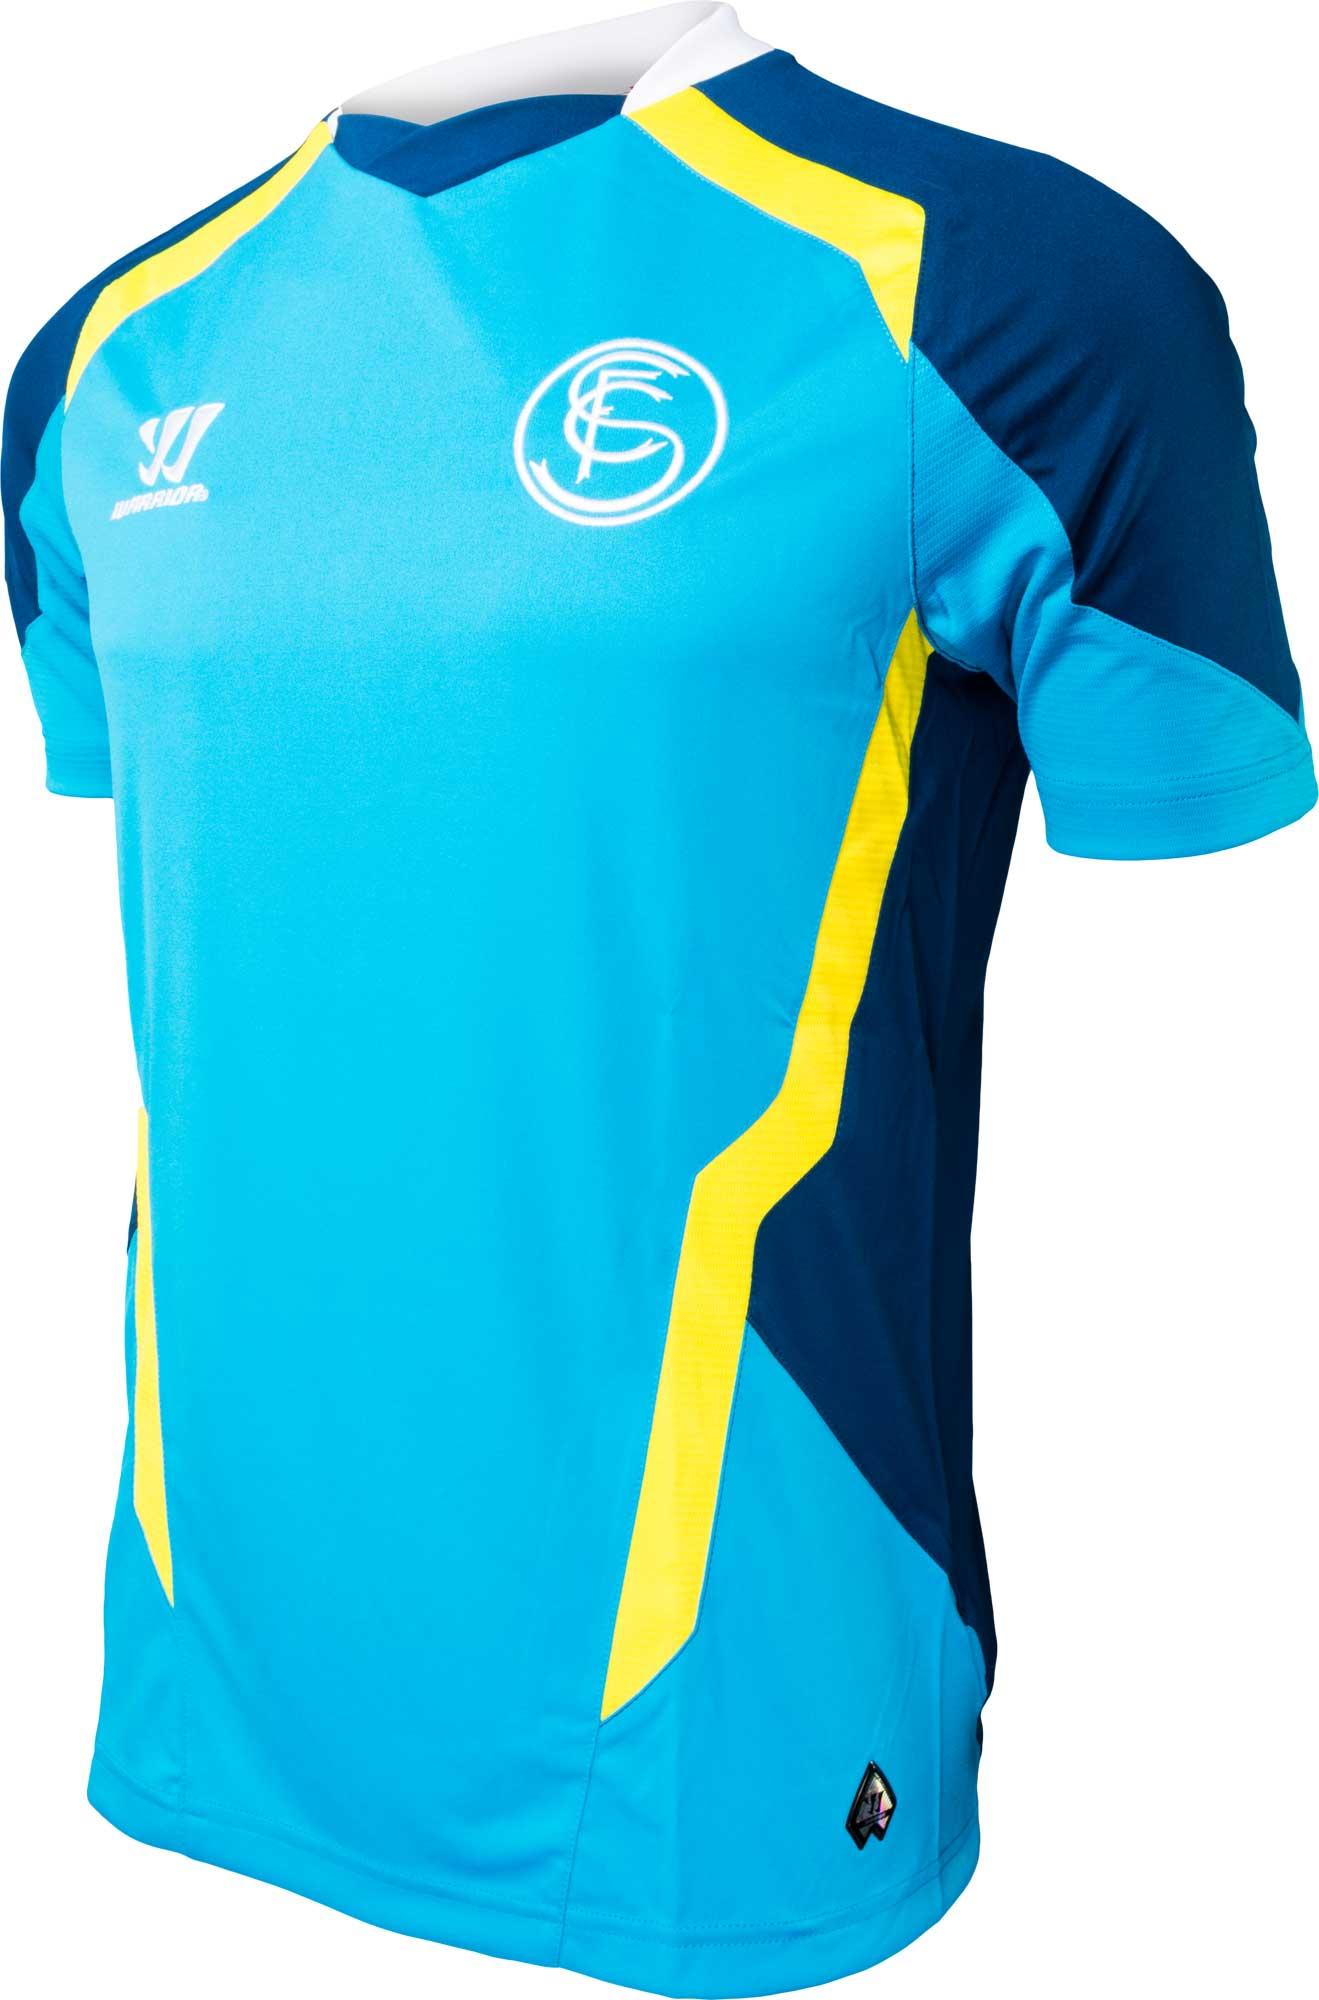 a1c9661a38e Sevilla Away Jersey - 2014 2015 Warrior Sevilla FC Jerseys